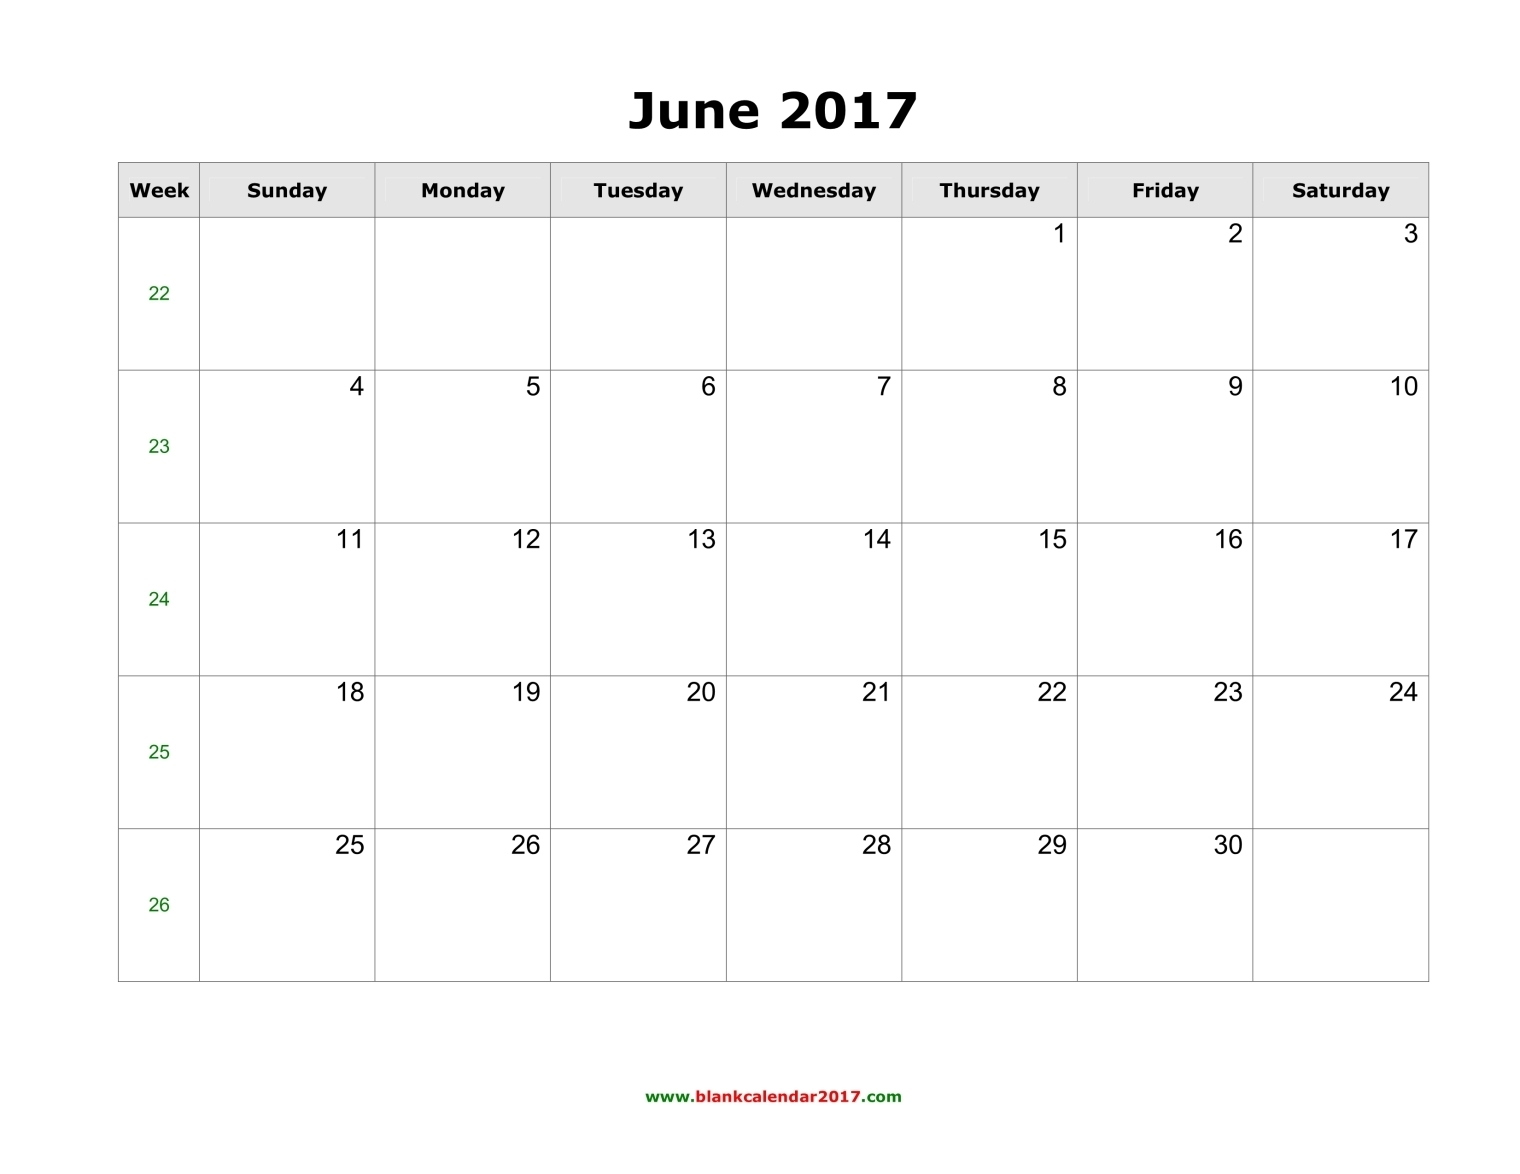 June 2017 Calendar Printable With Holidays | weekly calendar template